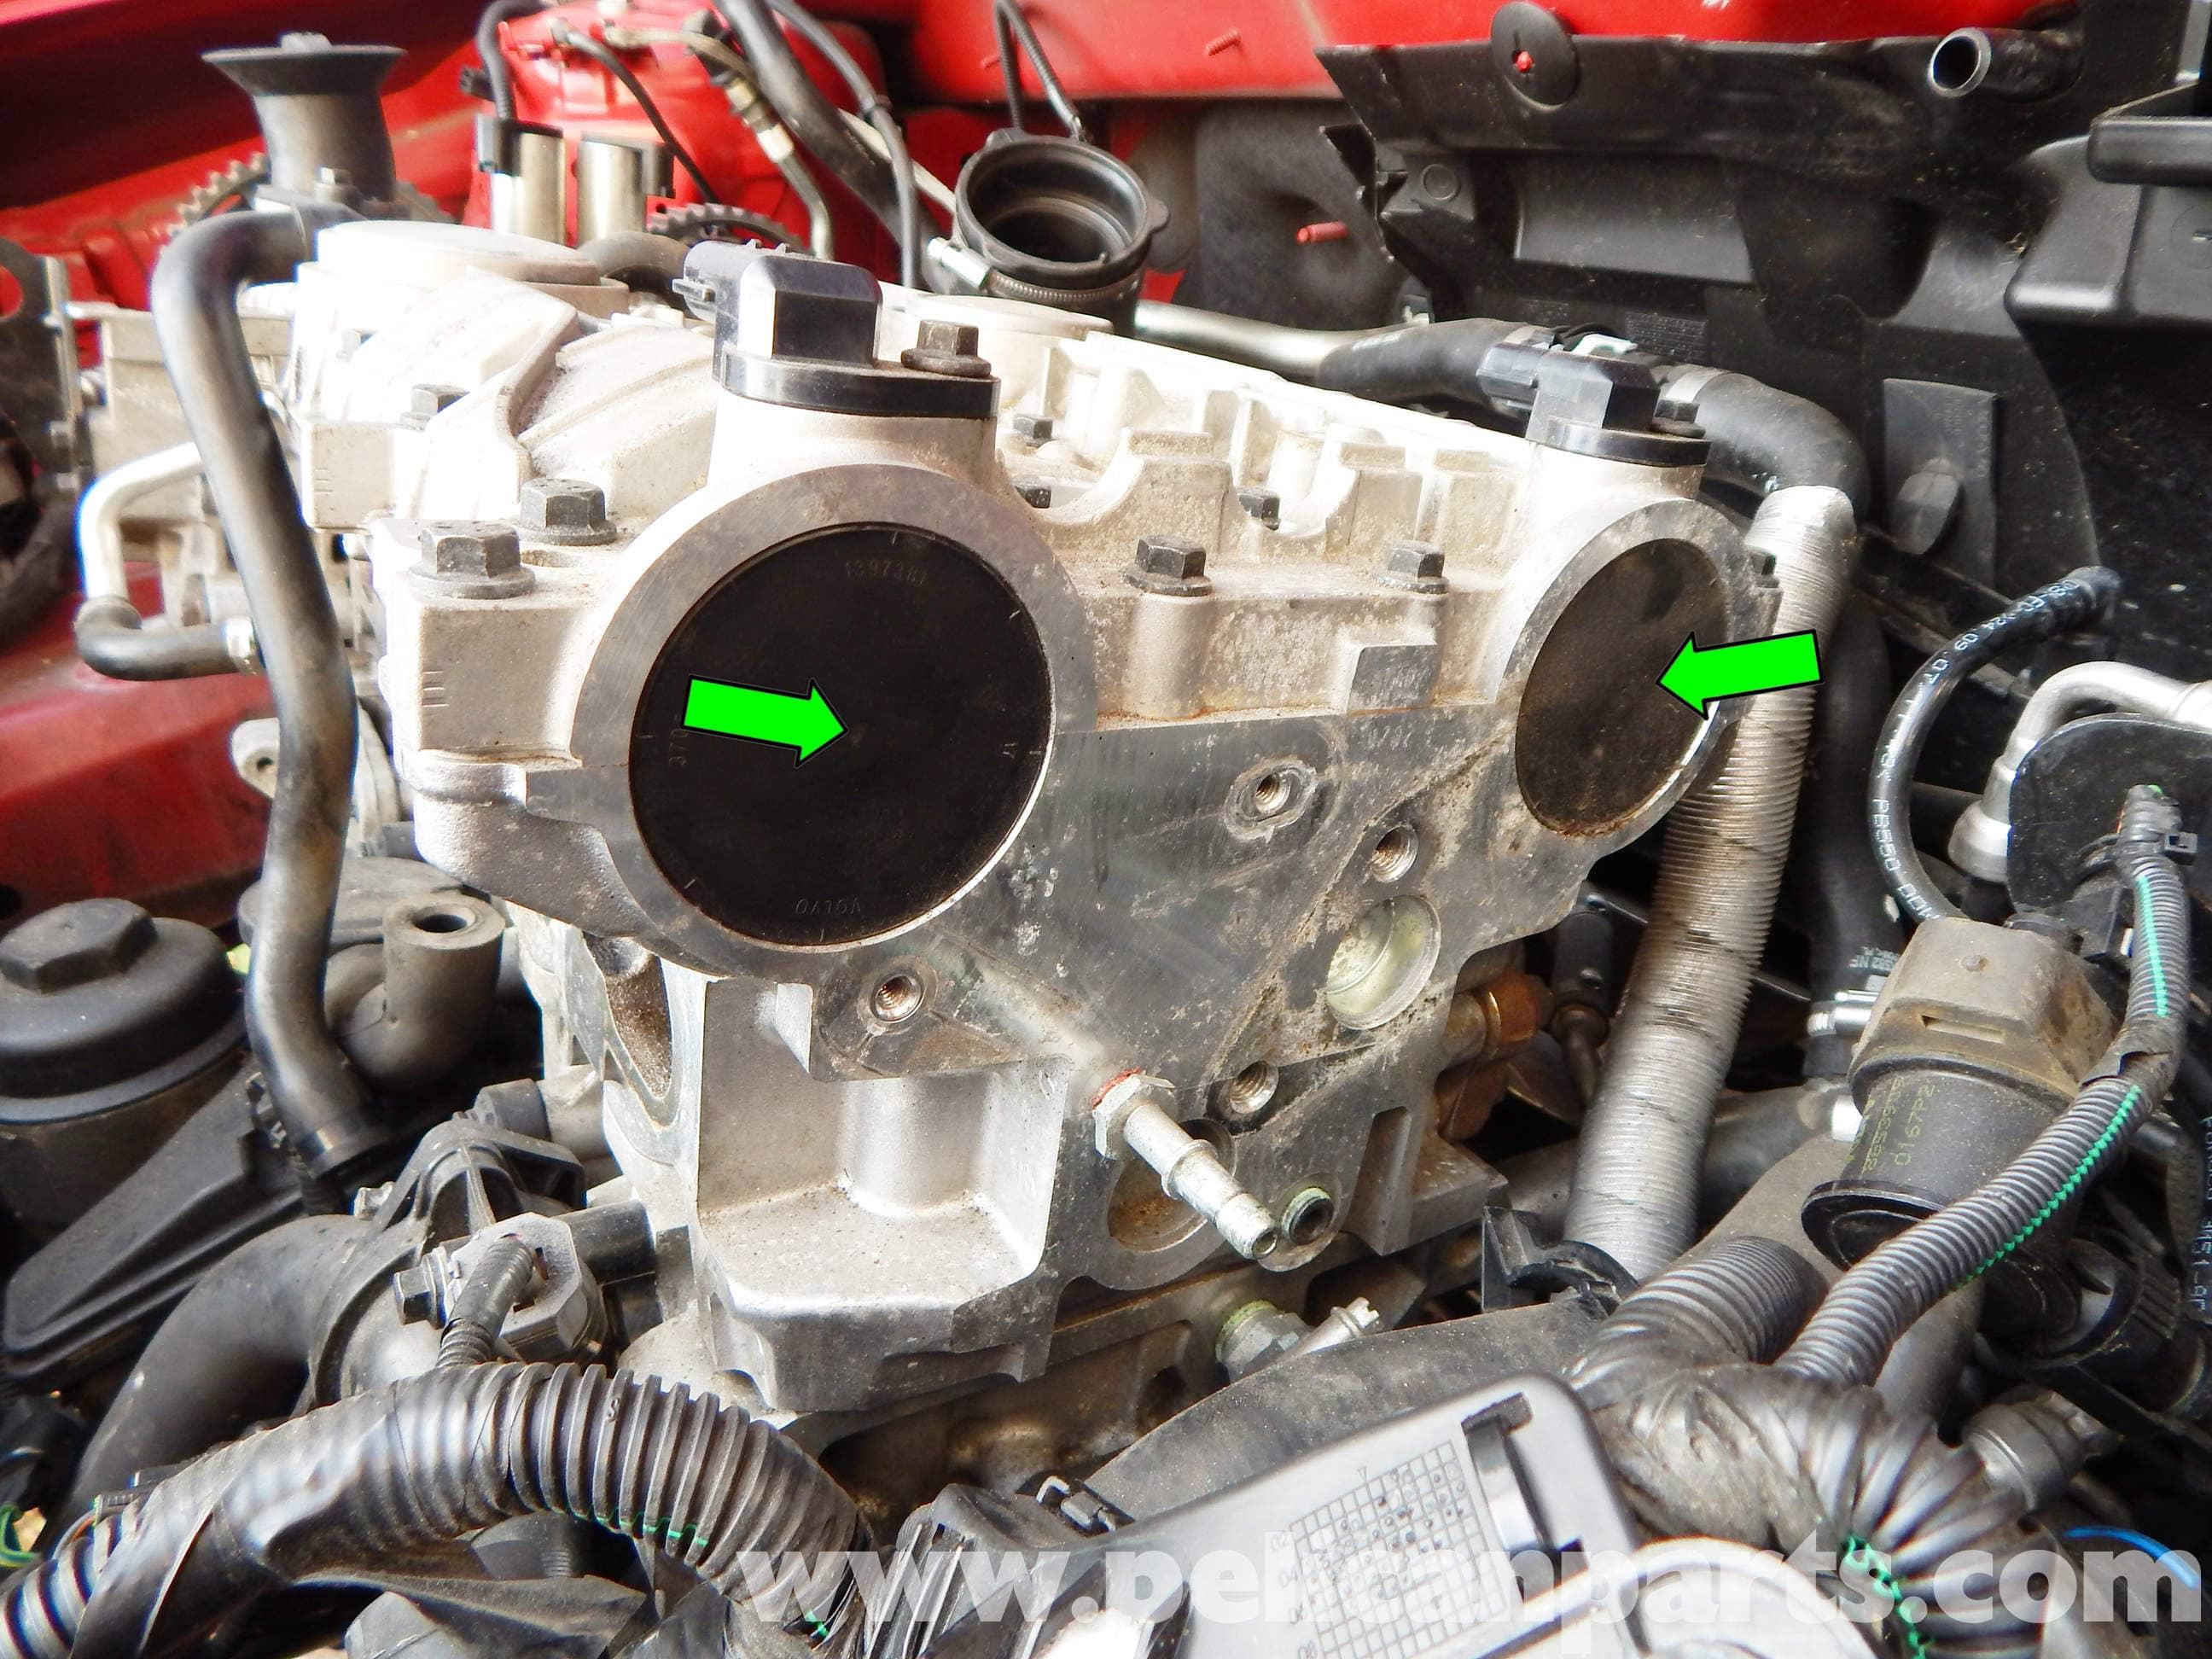 Volvo C30 VVT Unit Removal   C30 T5 (2008-2013), C30 T5 R-Design